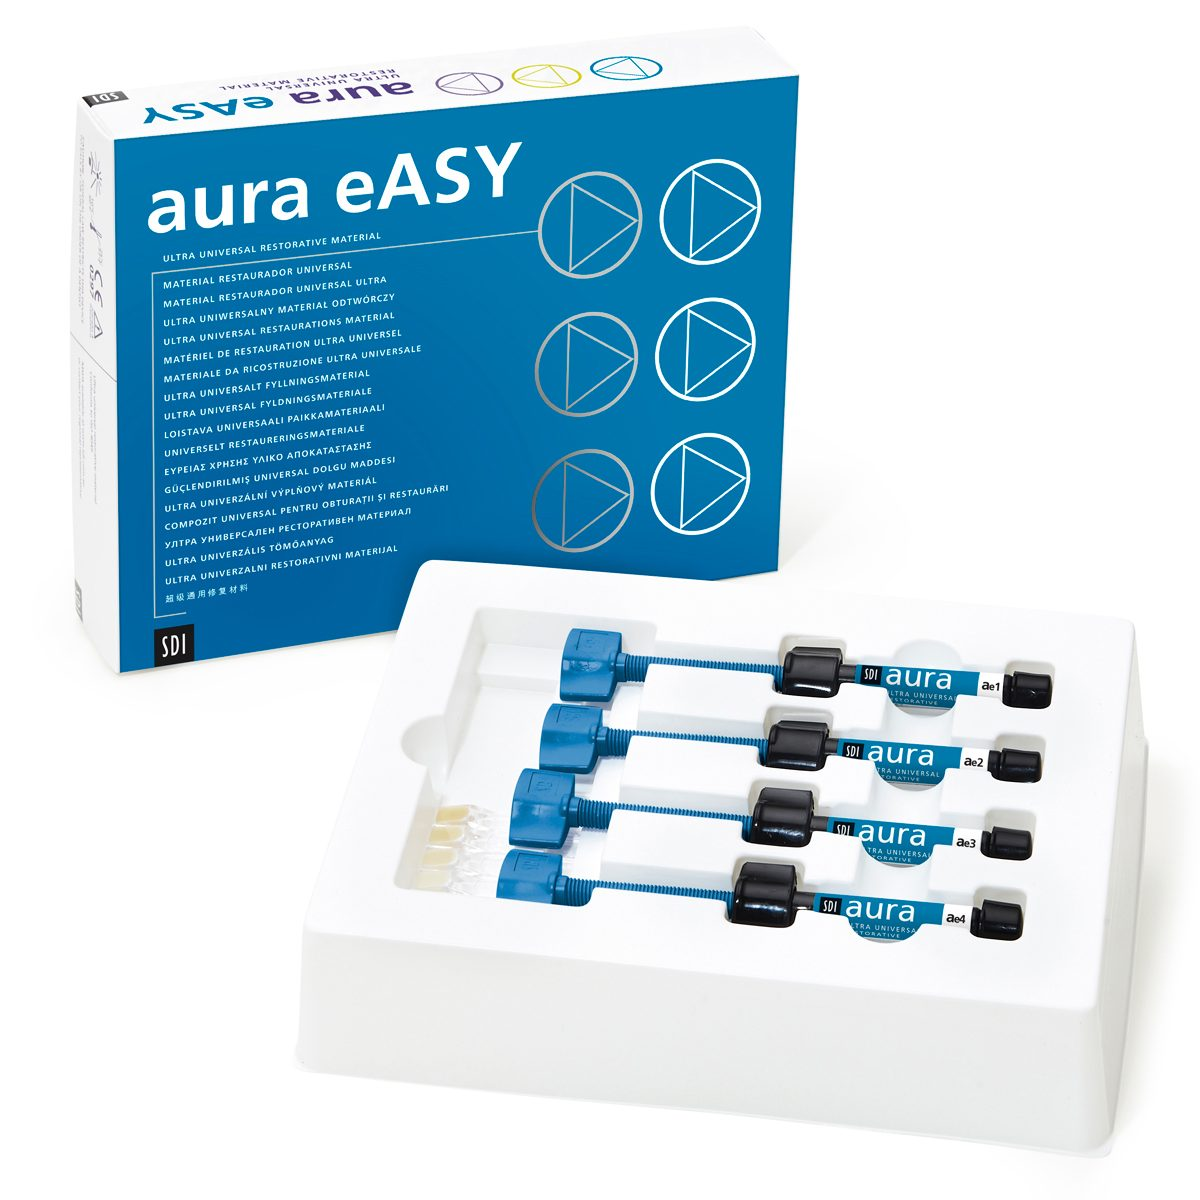 aura eASY